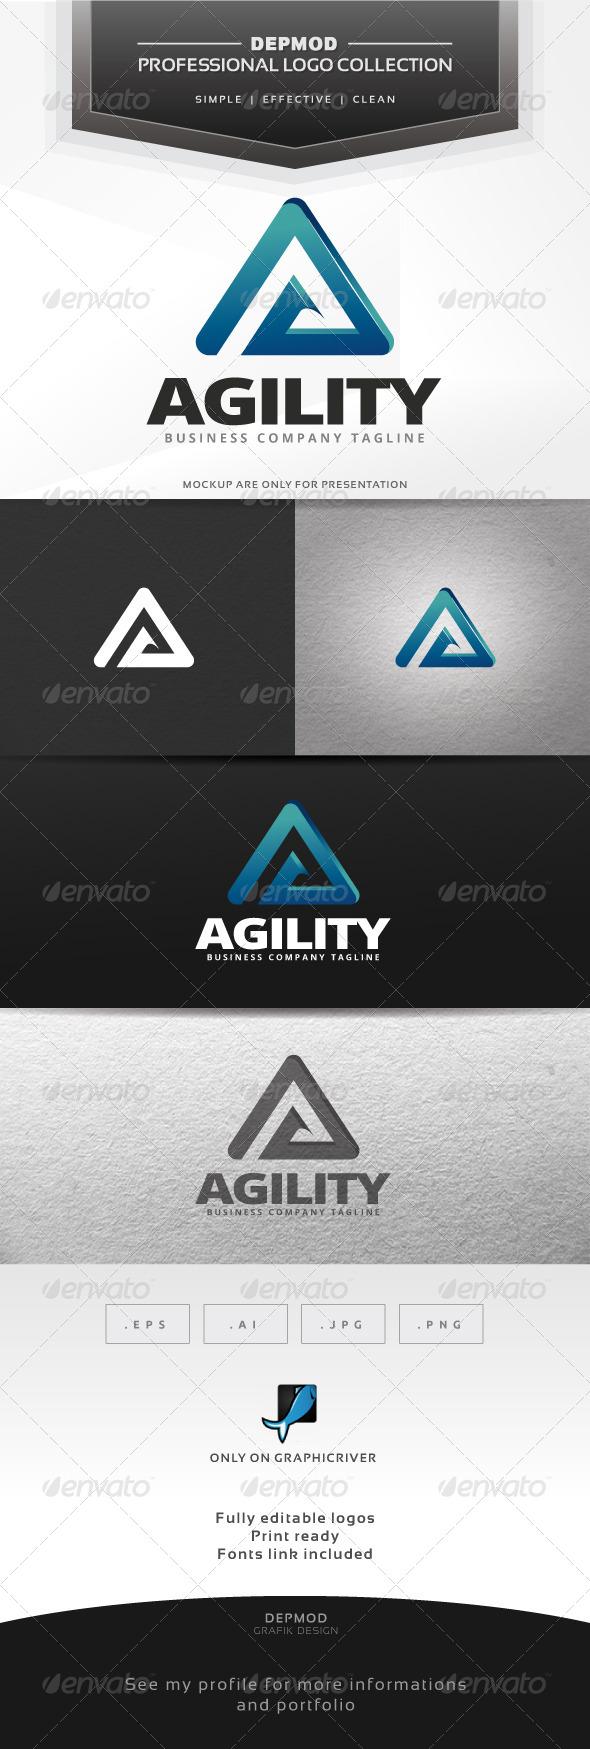 GraphicRiver Agility Logo 6968155